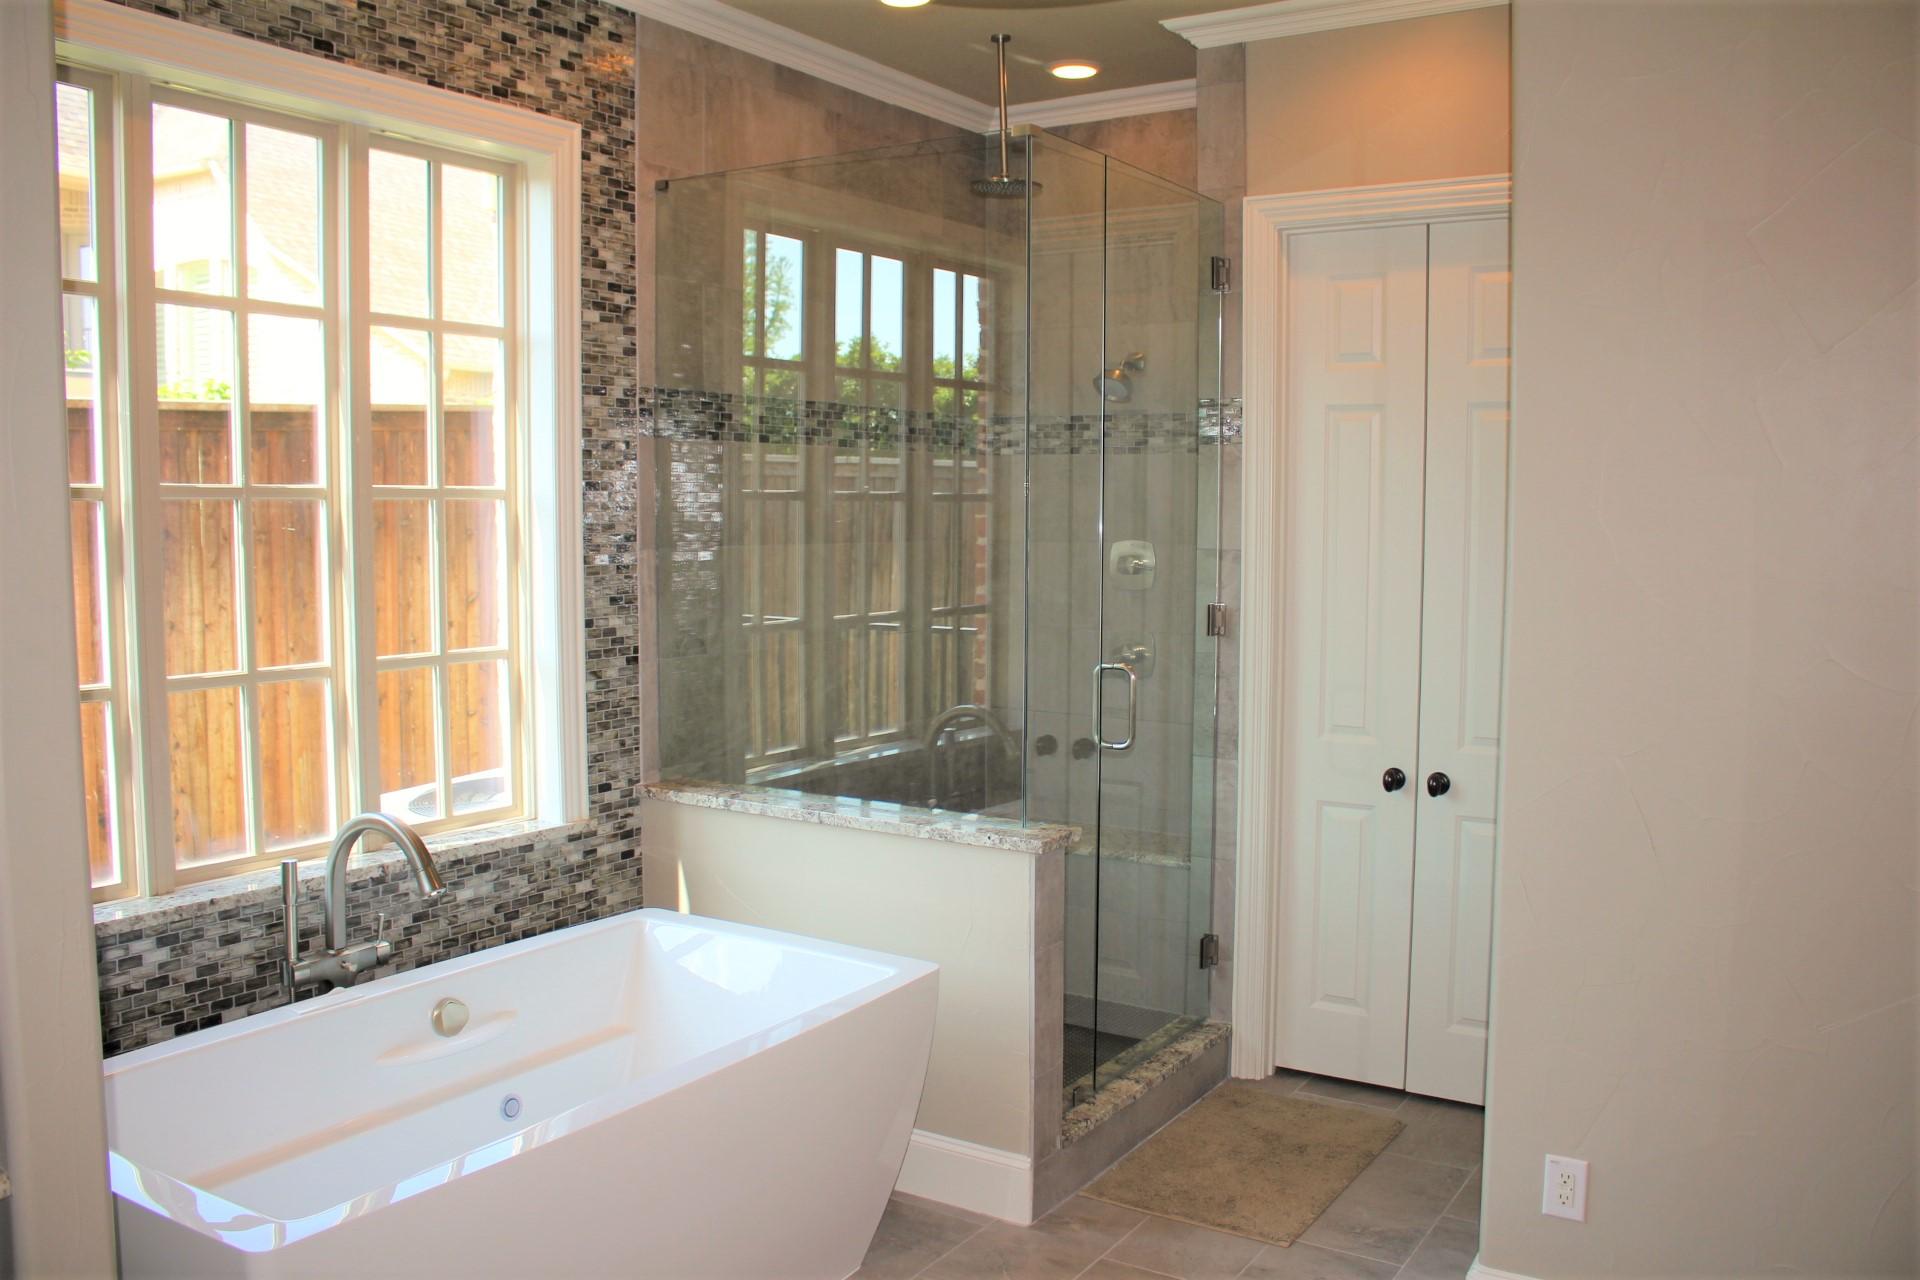 Kitchen And Bath Remodeling Kitchen Bath Remodeling Dallas Frisco Allen Mckinney Plano